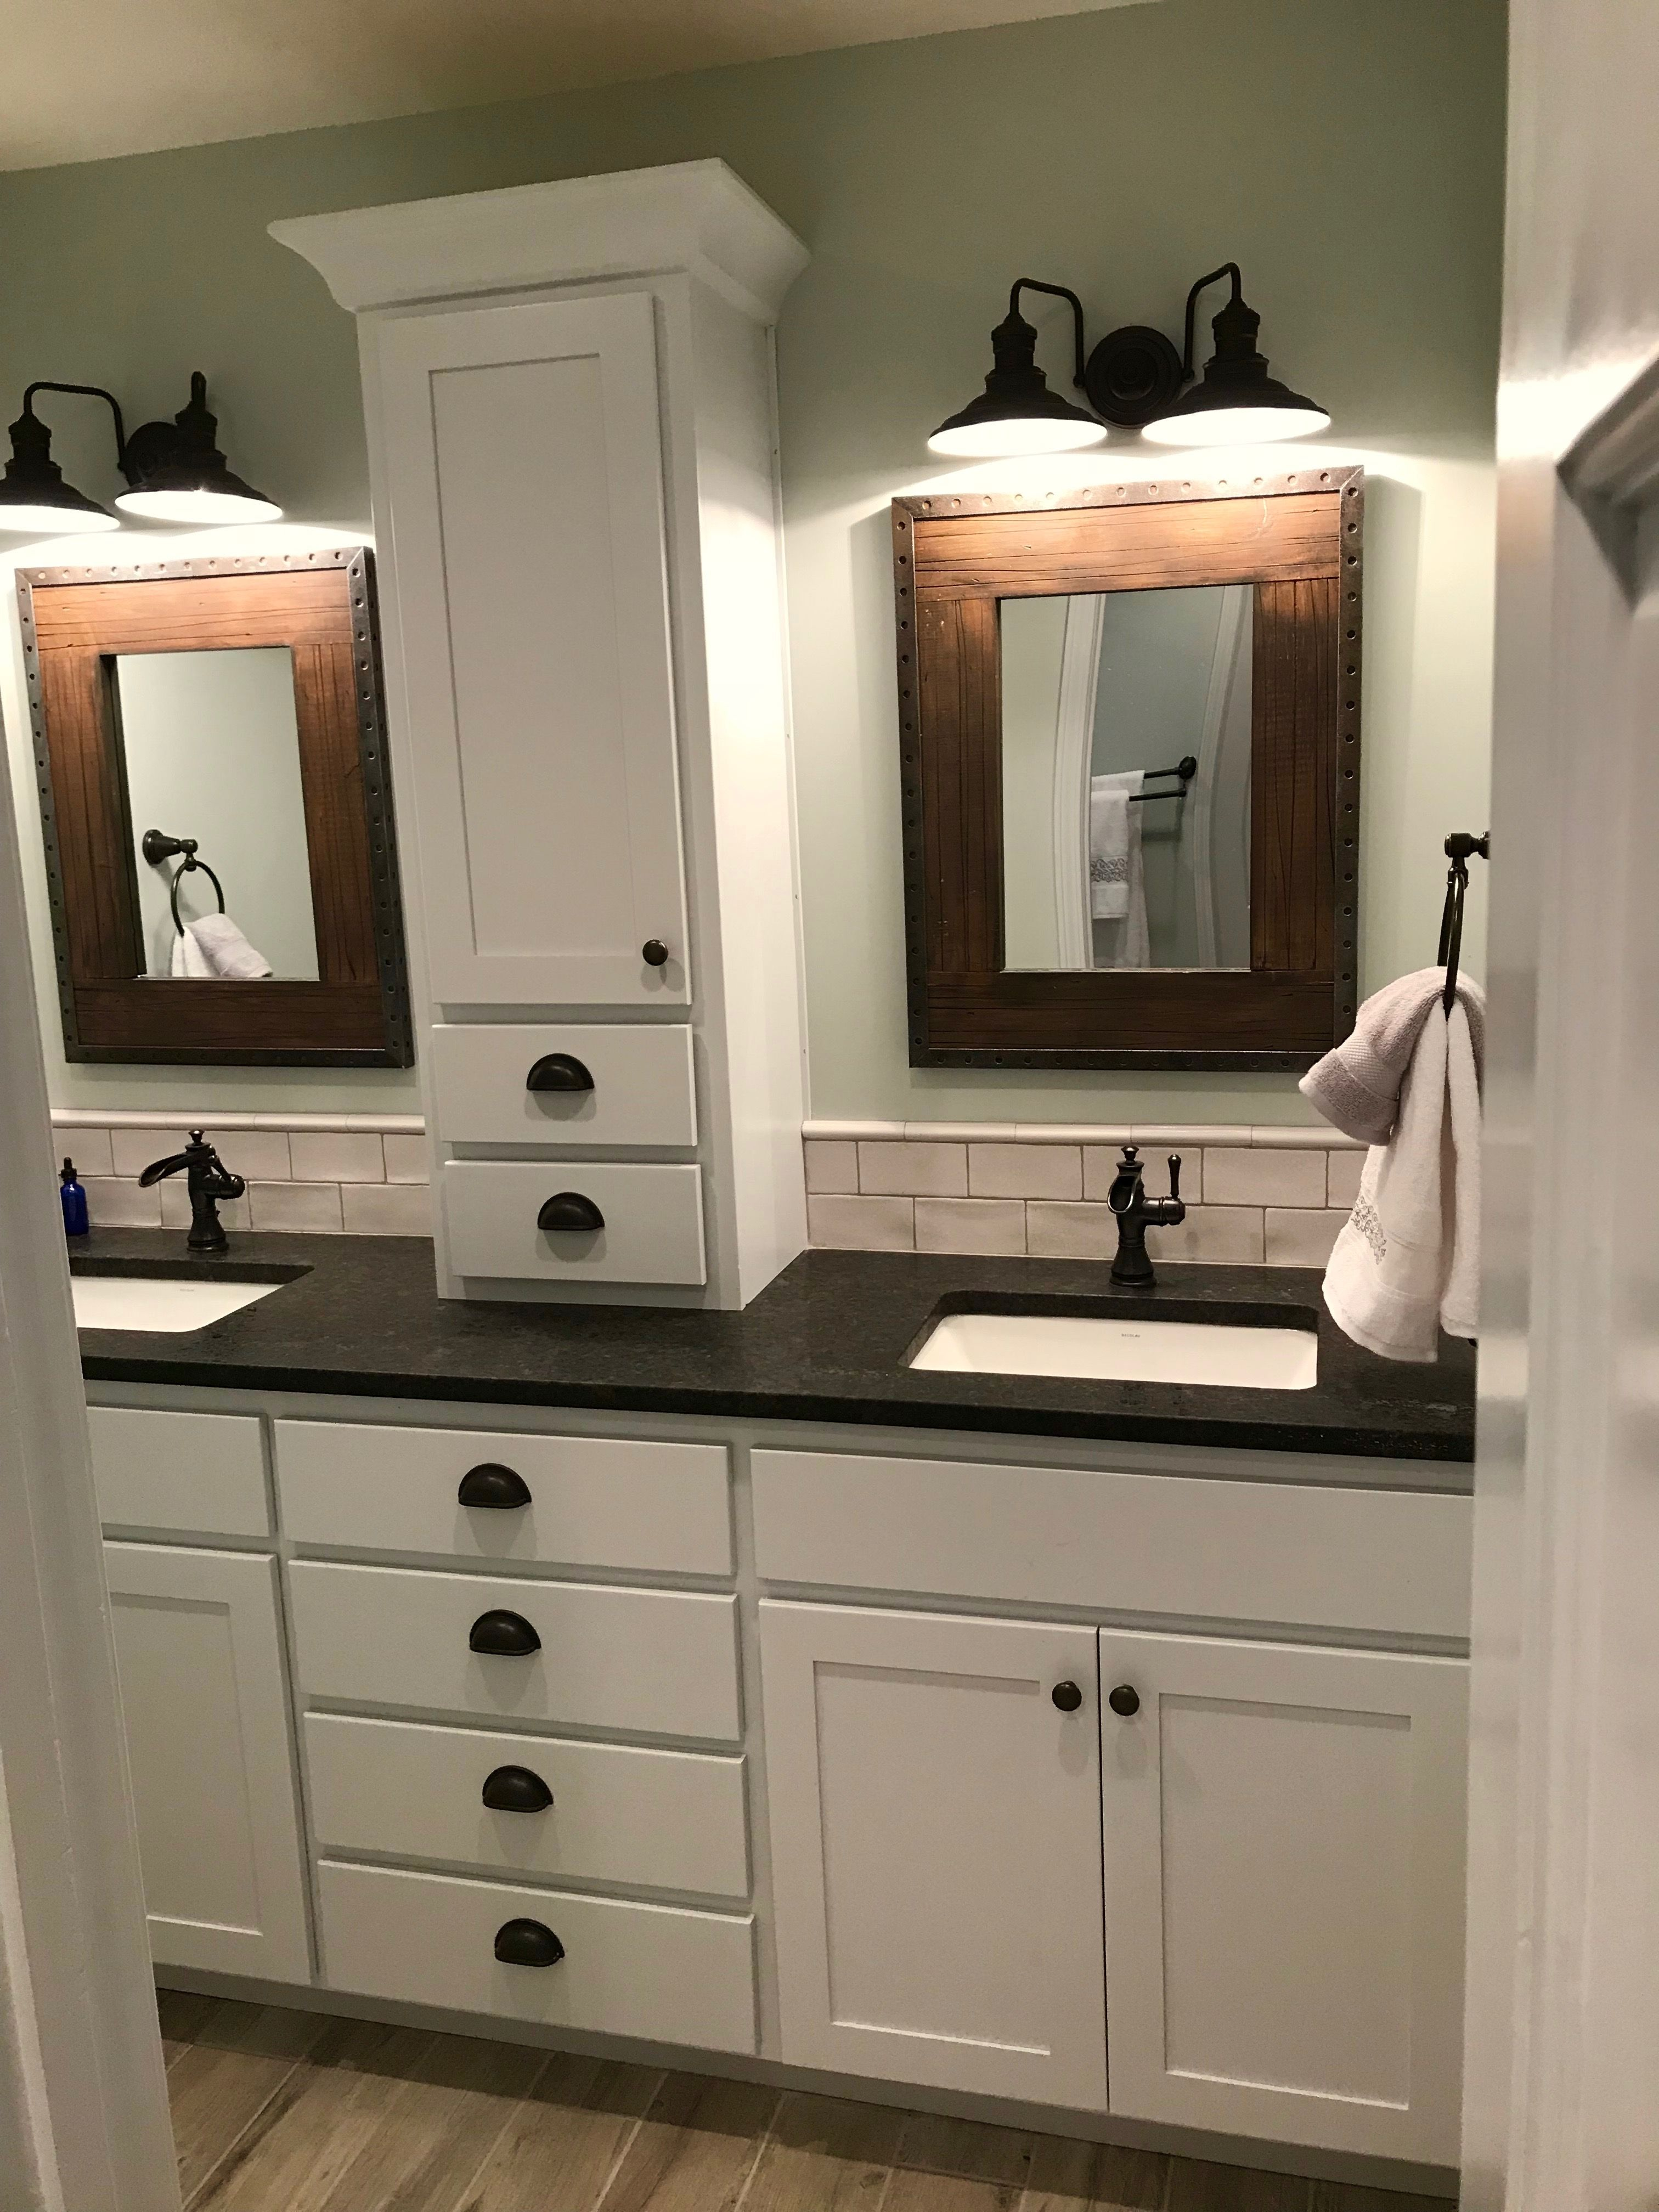 Cabinet Storage Bathroom Vanity Designs Bathroom Remodel Master